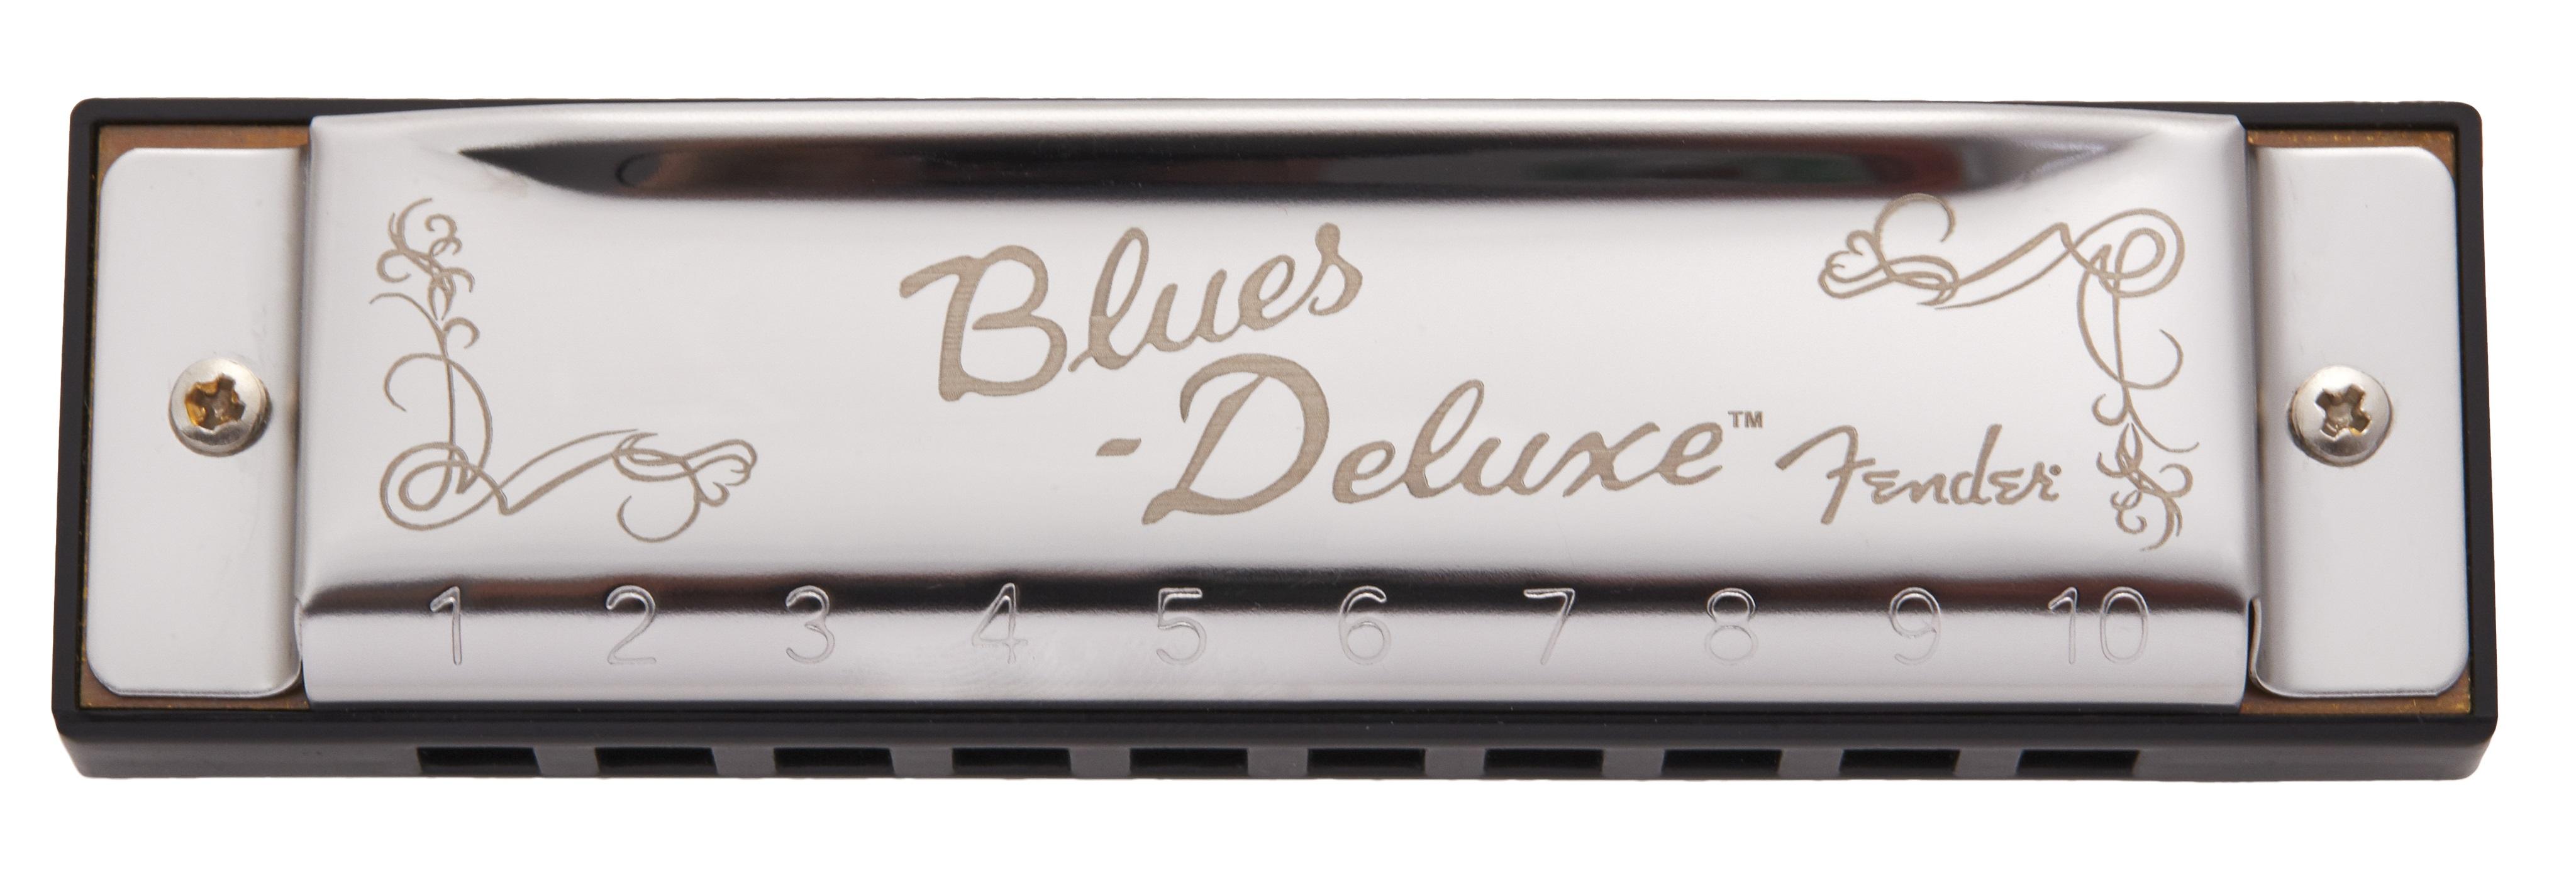 Fender Blues Deluxe Key of D